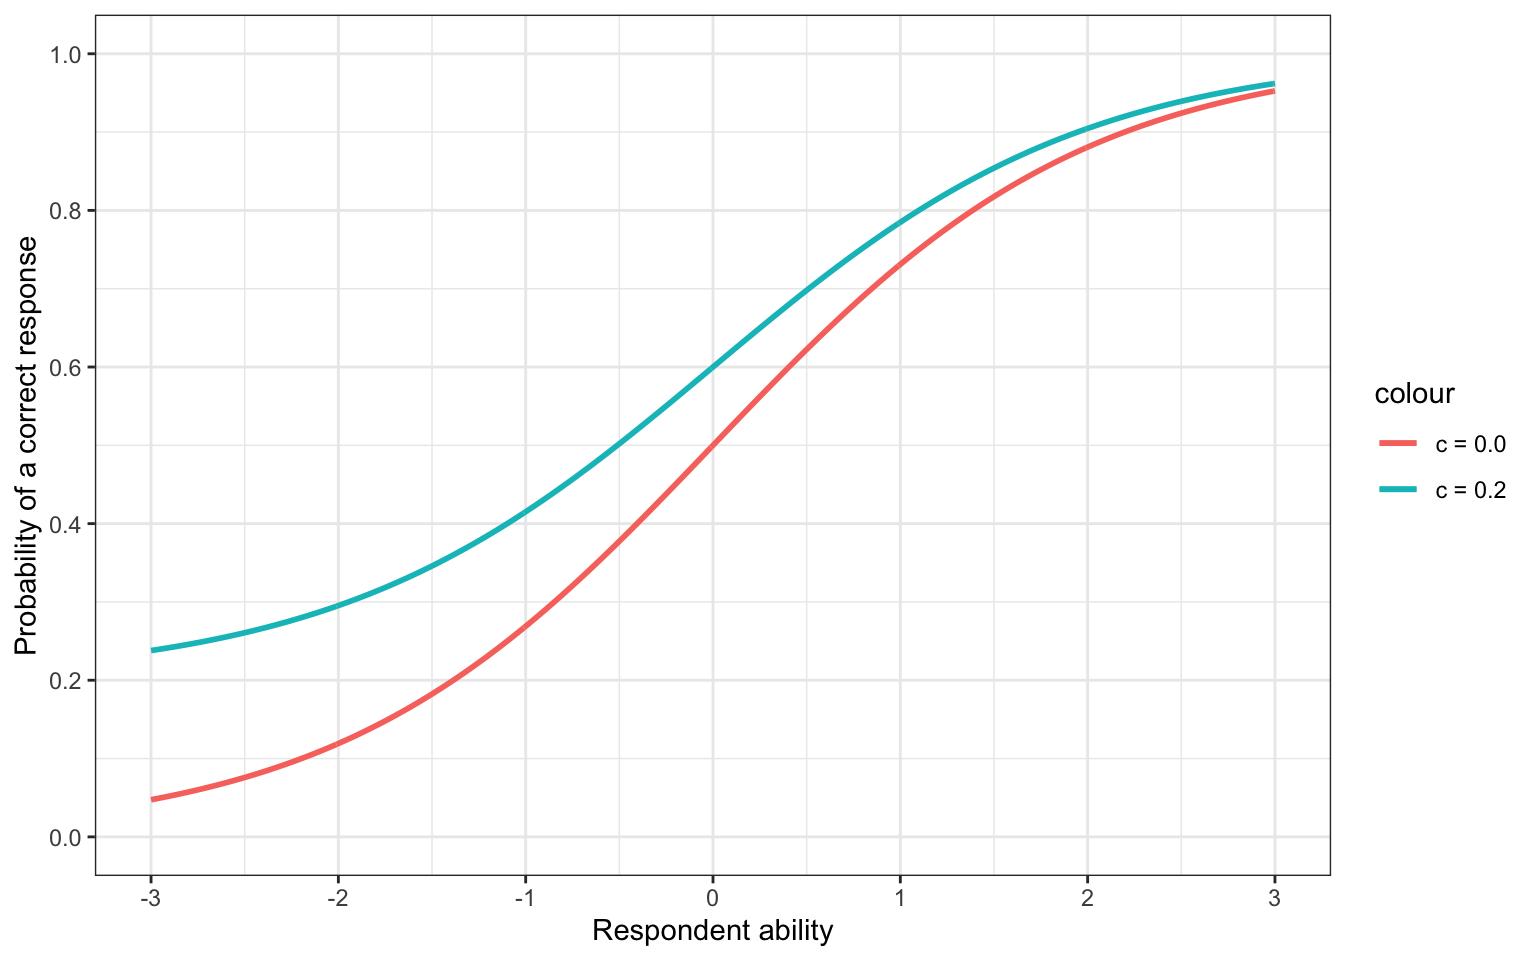 Shifting the c parameter